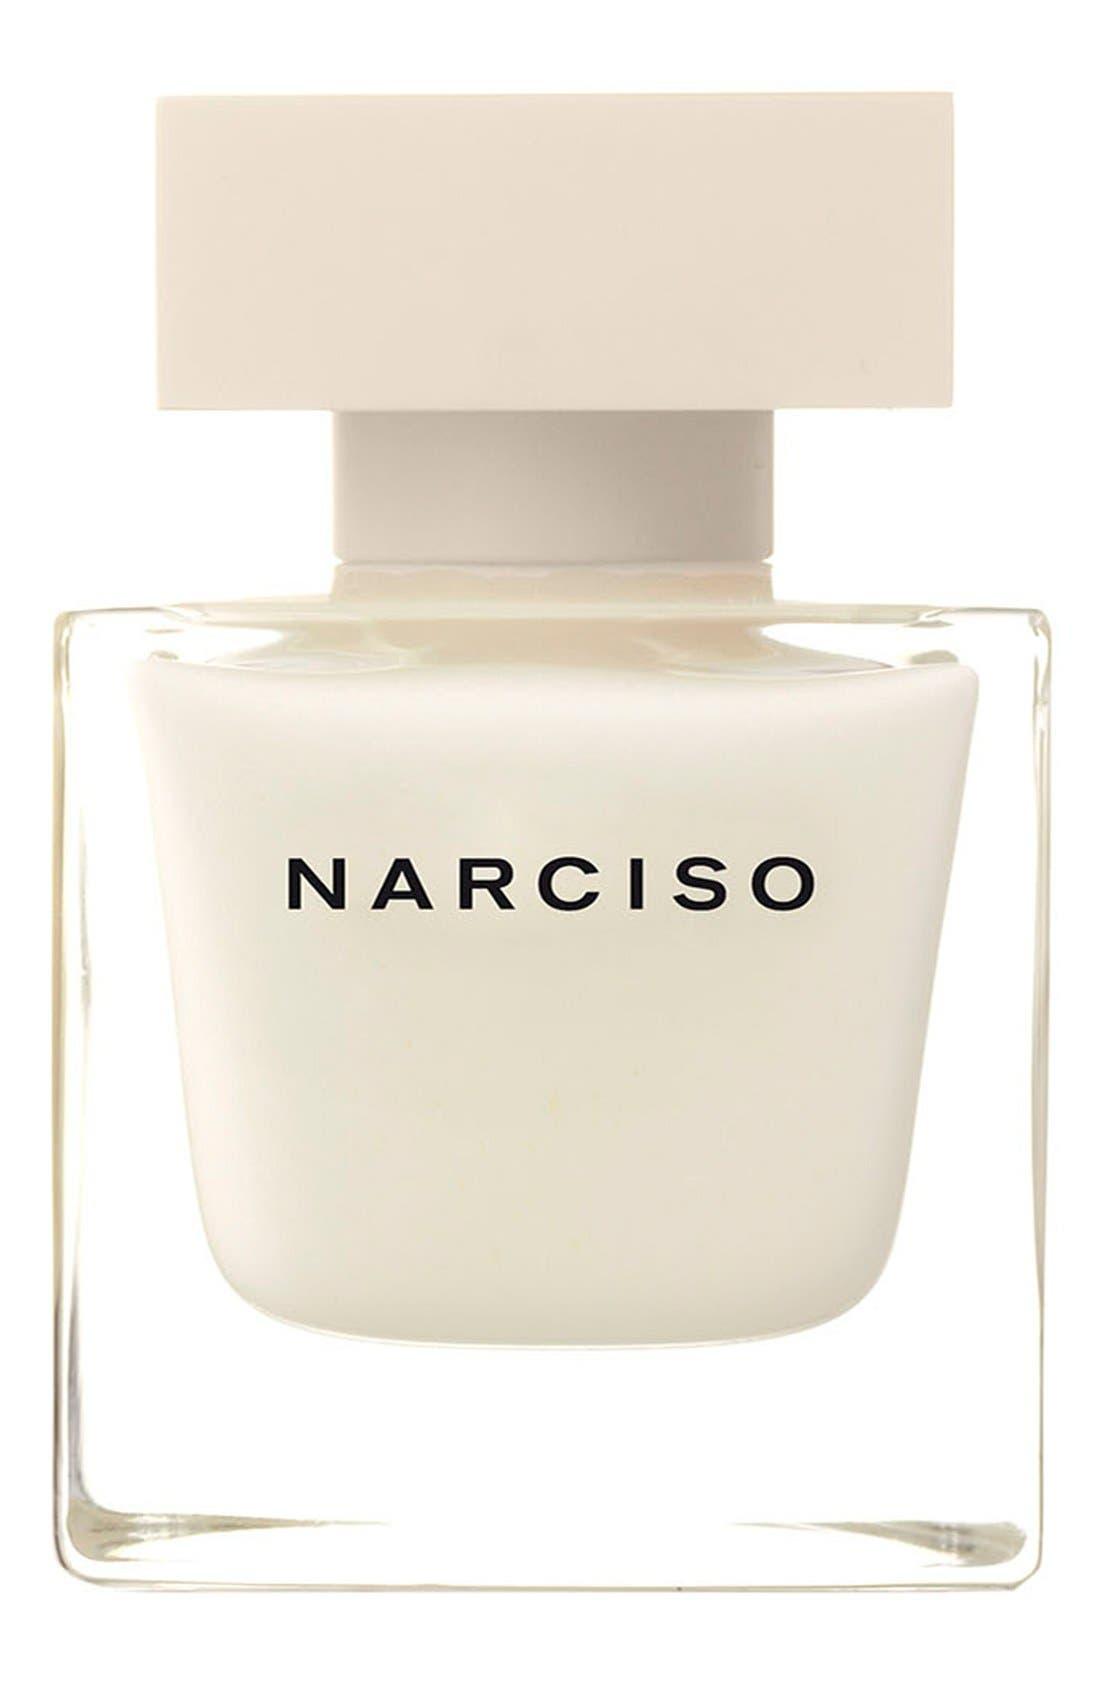 Narciso Rodriguez 'Narciso' Eau de Parfum